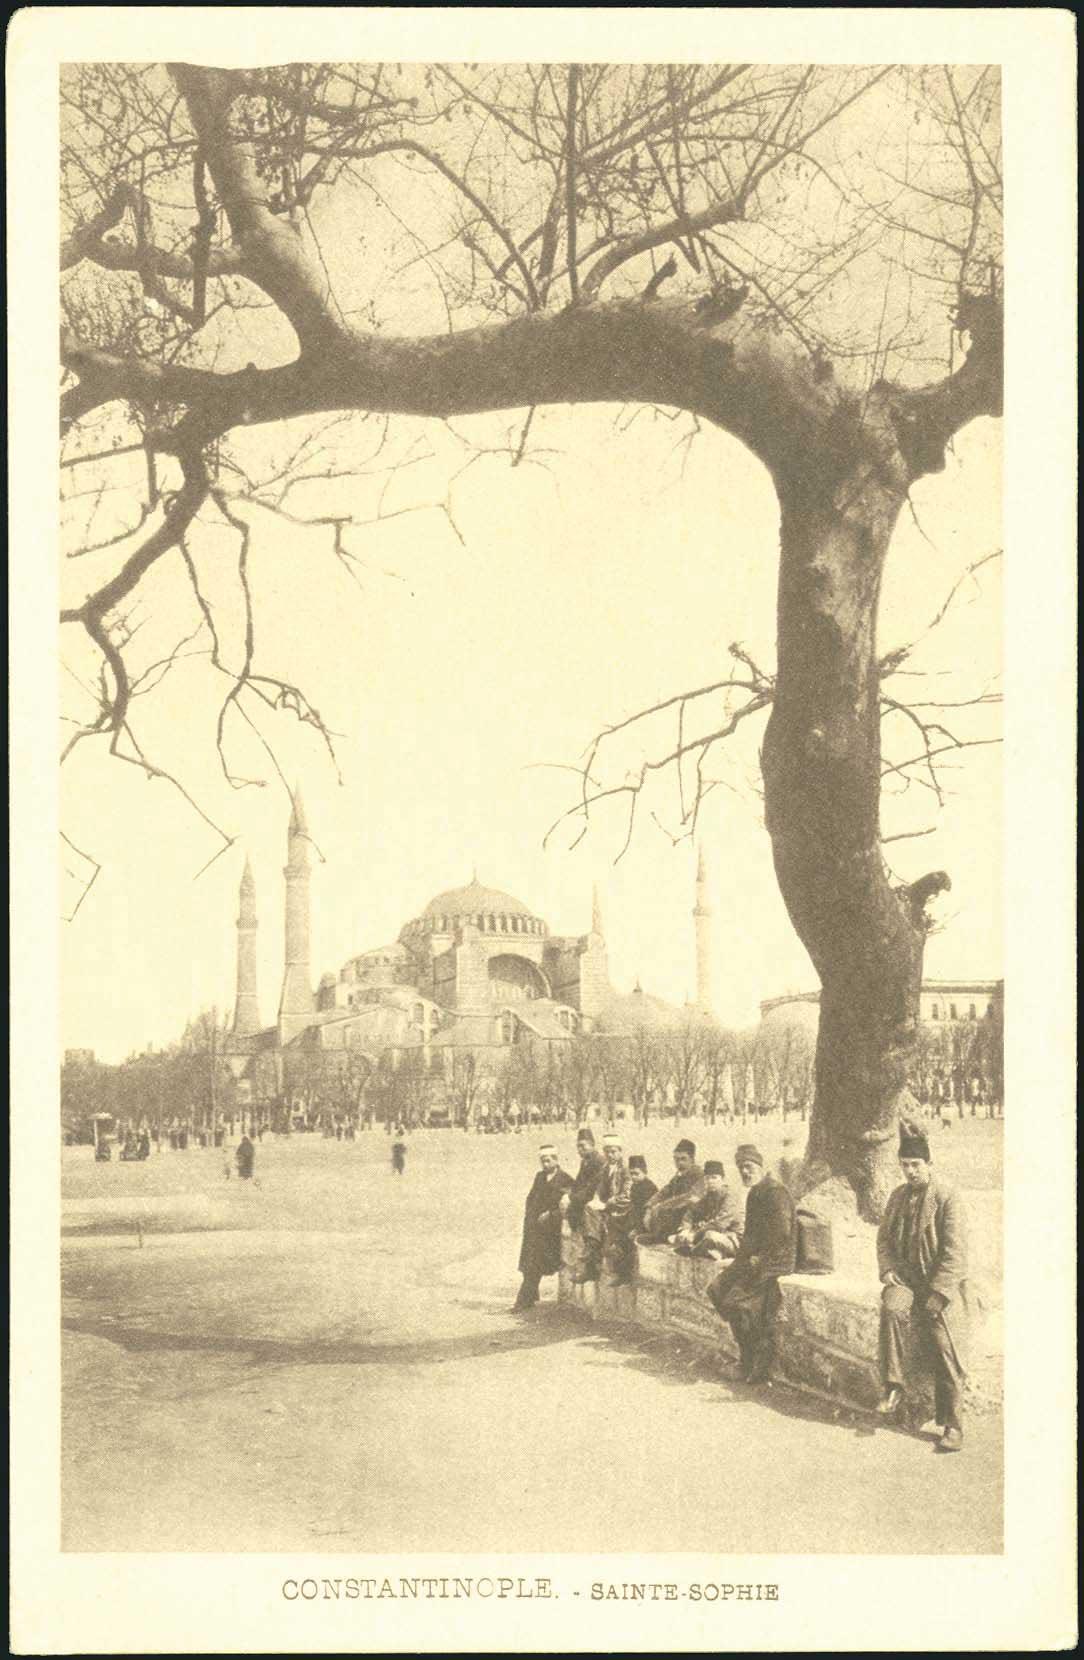 Lot 1807 - -  PICTURE POSTCARDS SMYRNE, CONSTANTINOPLE, ASIA MINOR -  A. Karamitsos Postal & Live Internet Auction 677